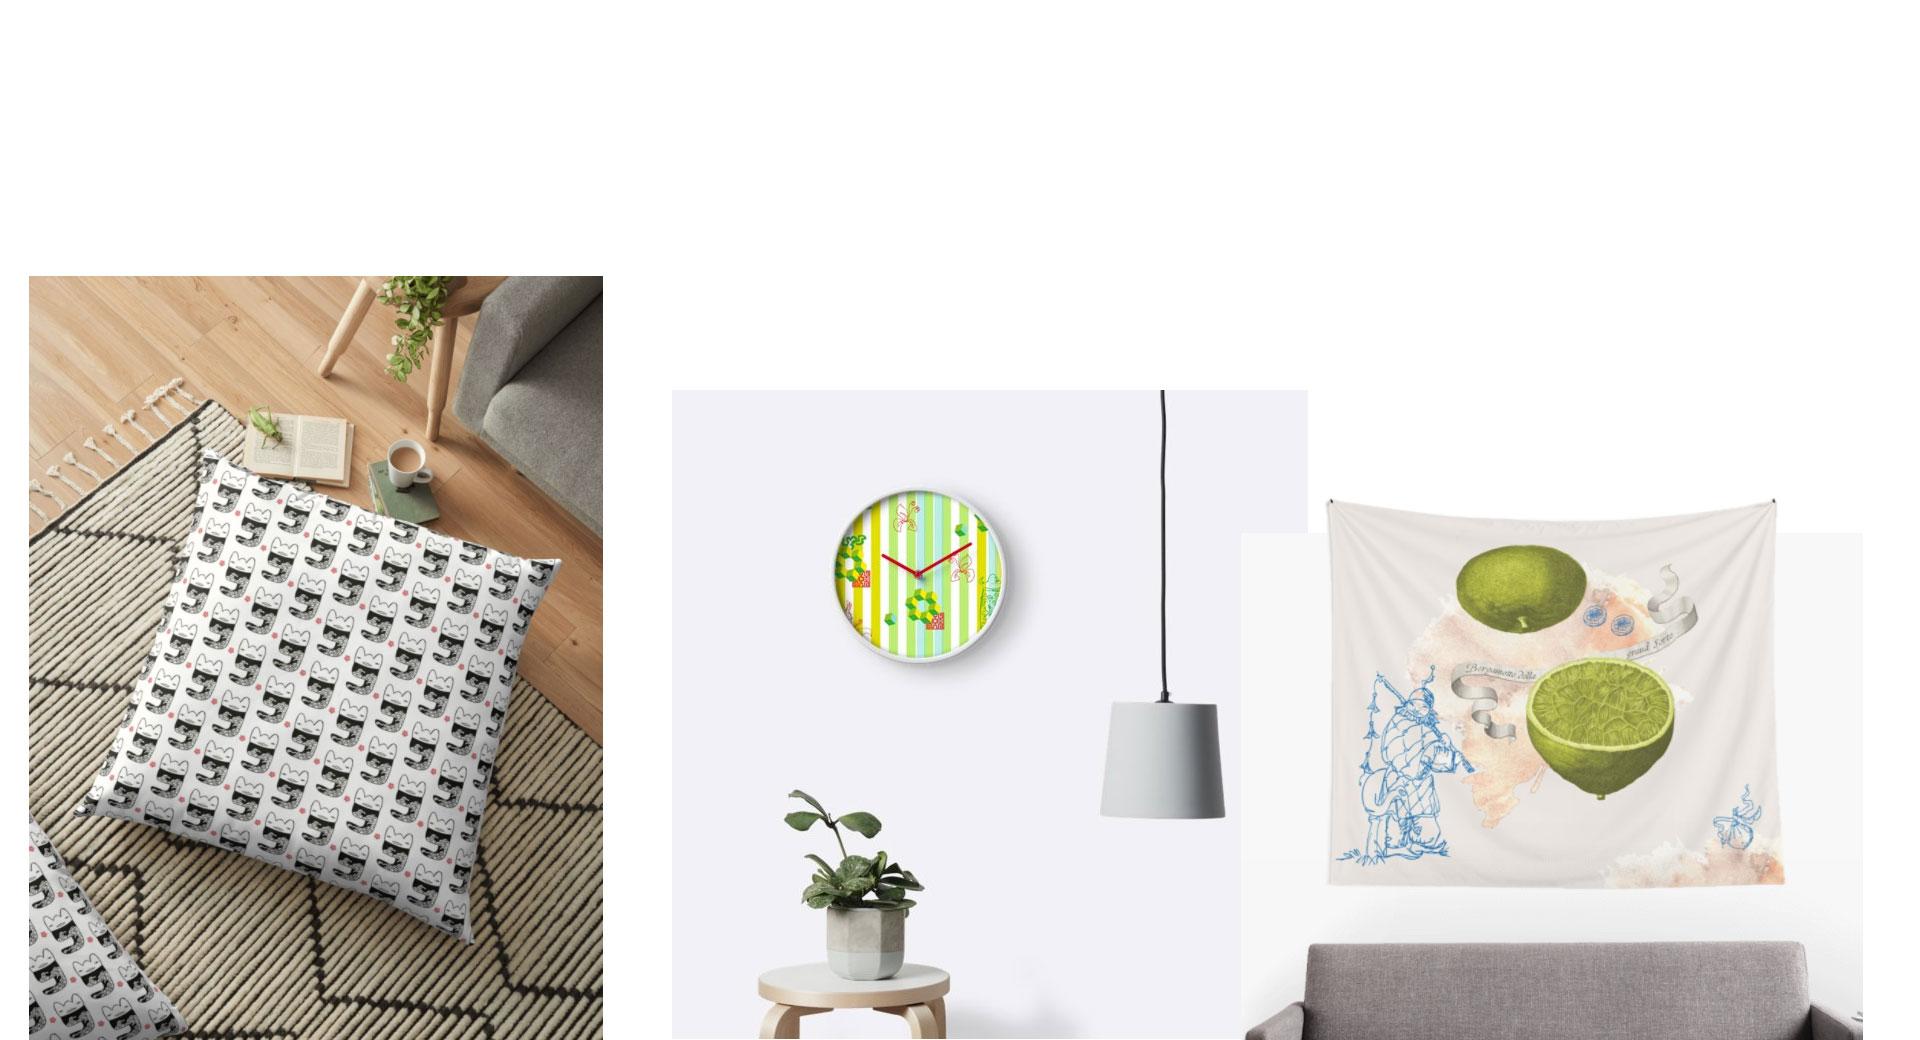 Wohnraumdekoration, Wandbehang, Kissen